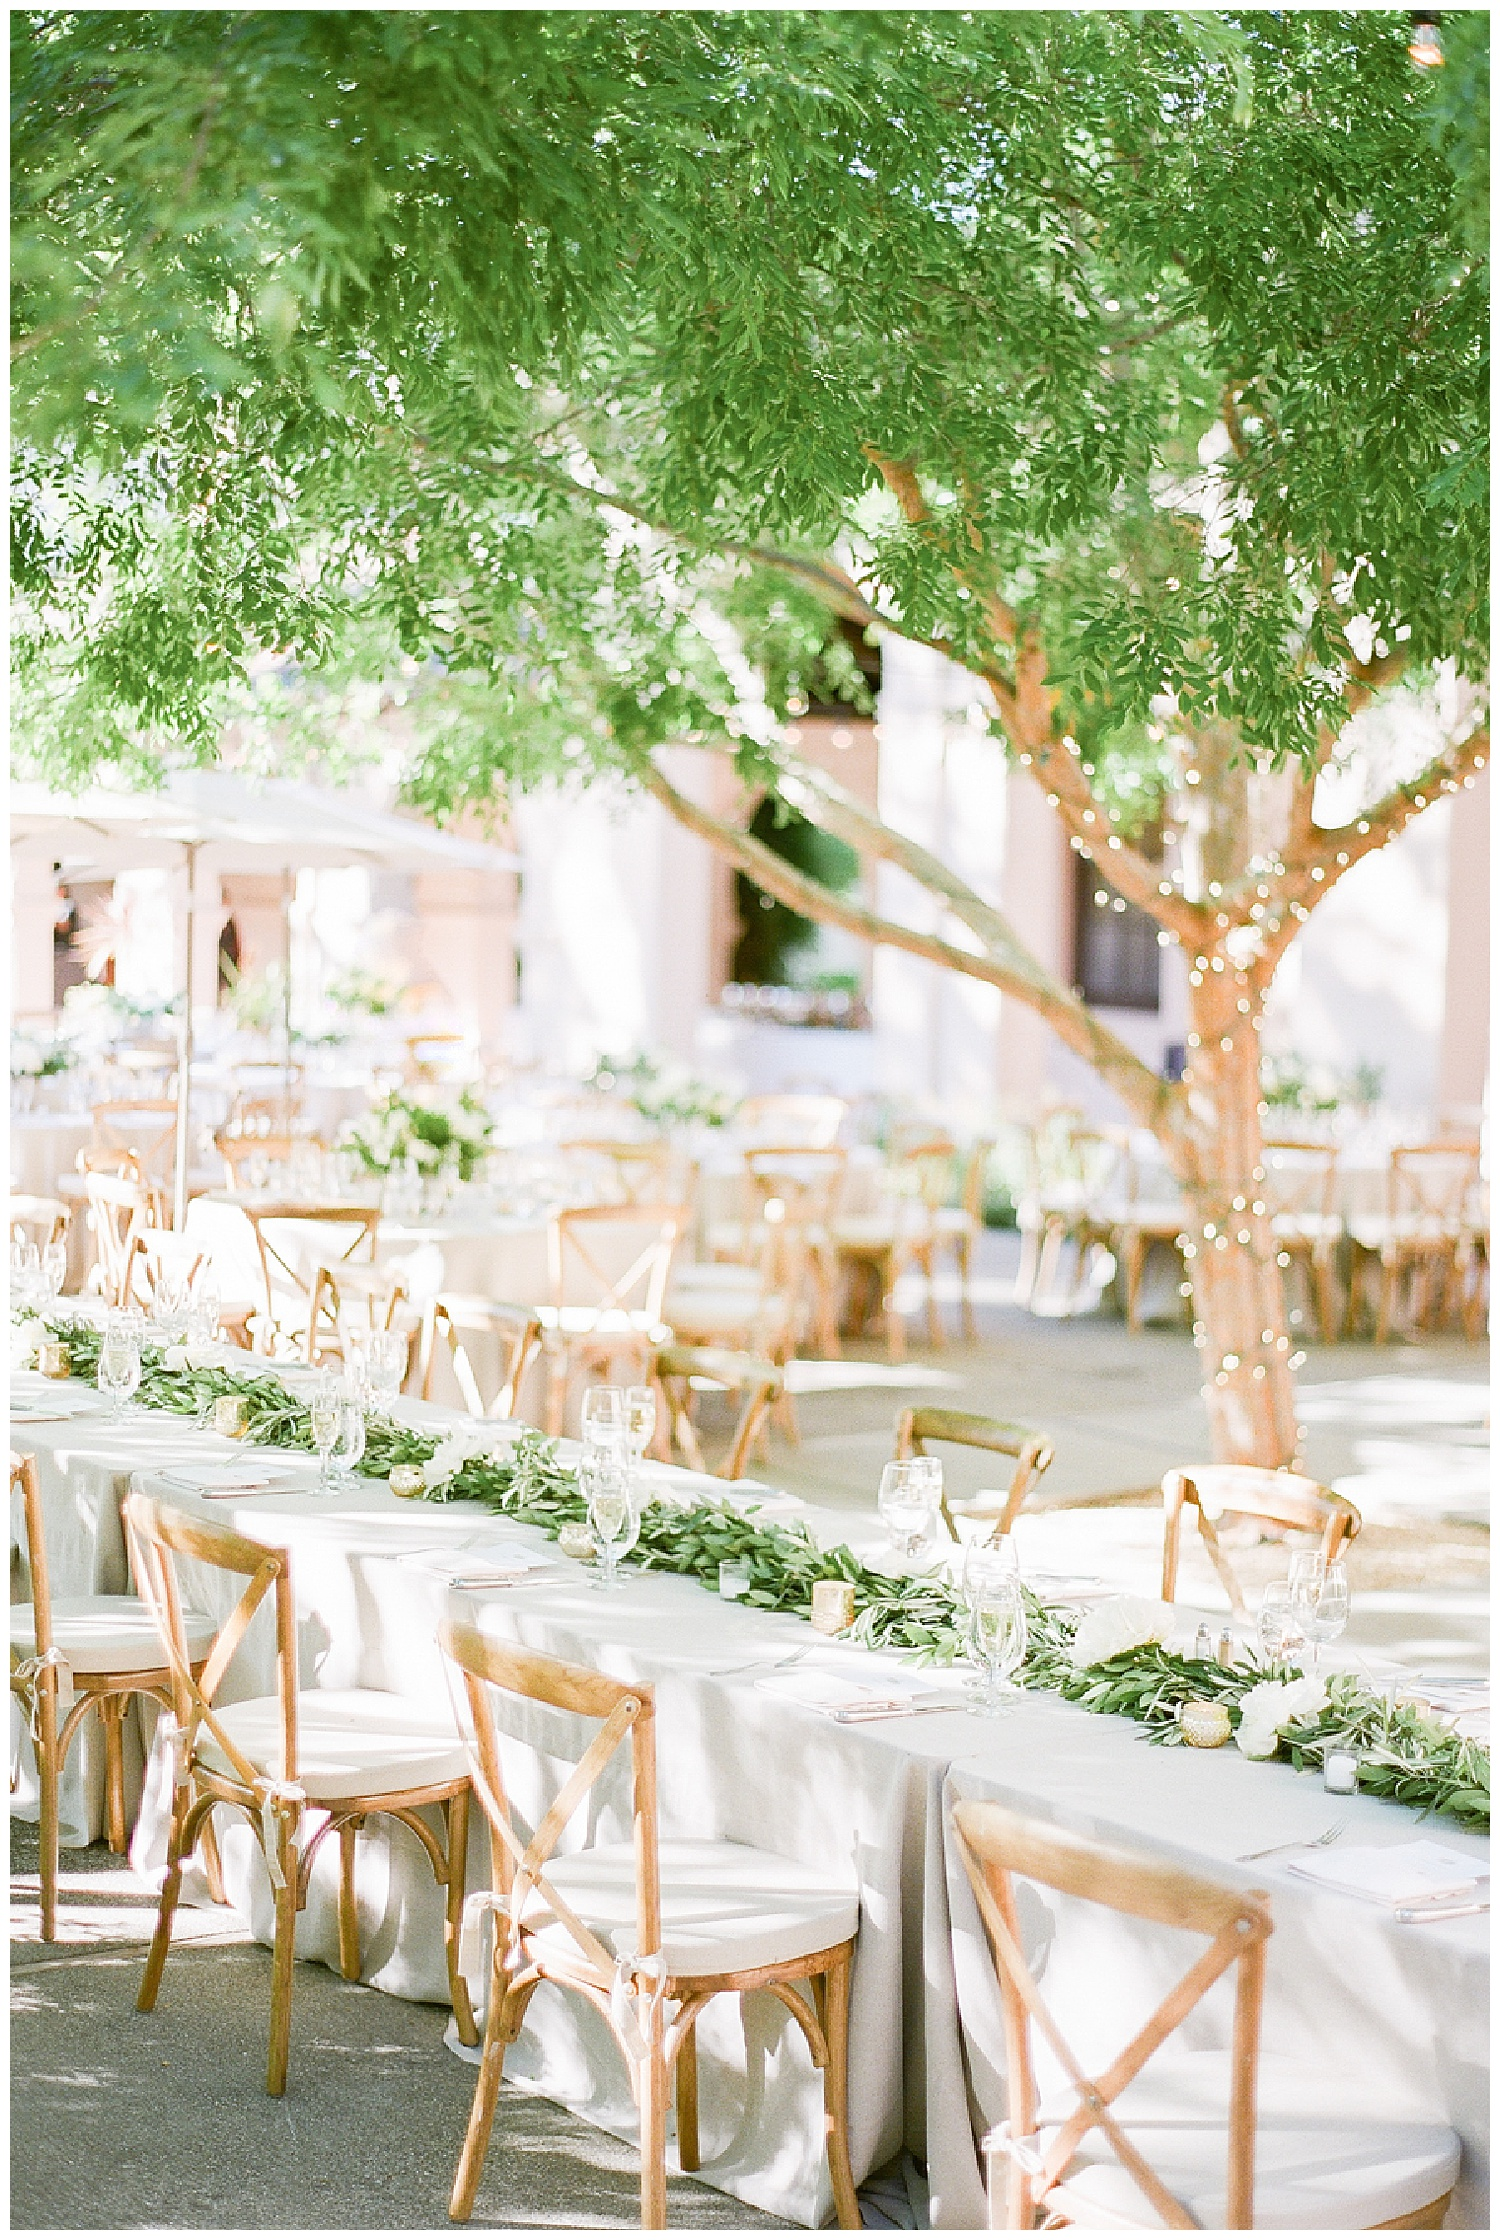 Janine_Licare_Photography_San_Francisco_Wedding_Photographer_0121.jpg